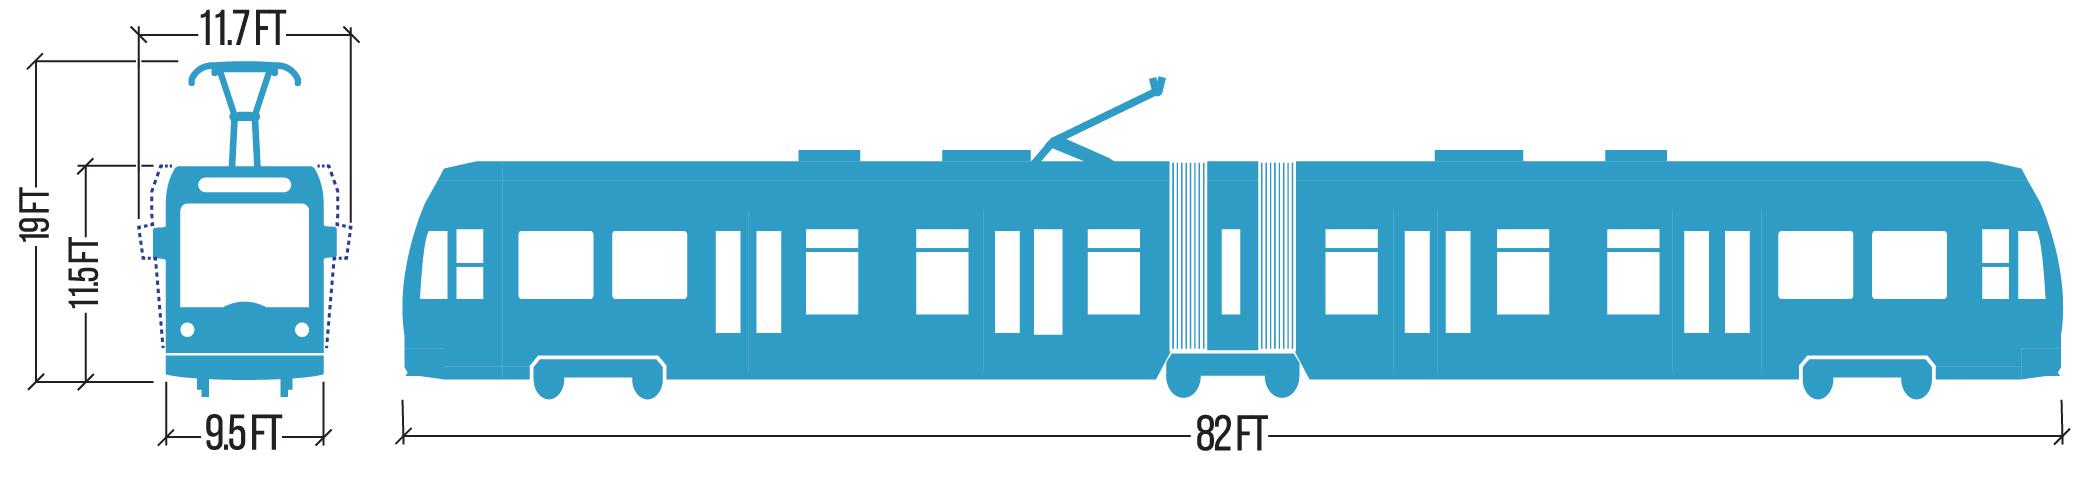 Vehicle Types-04